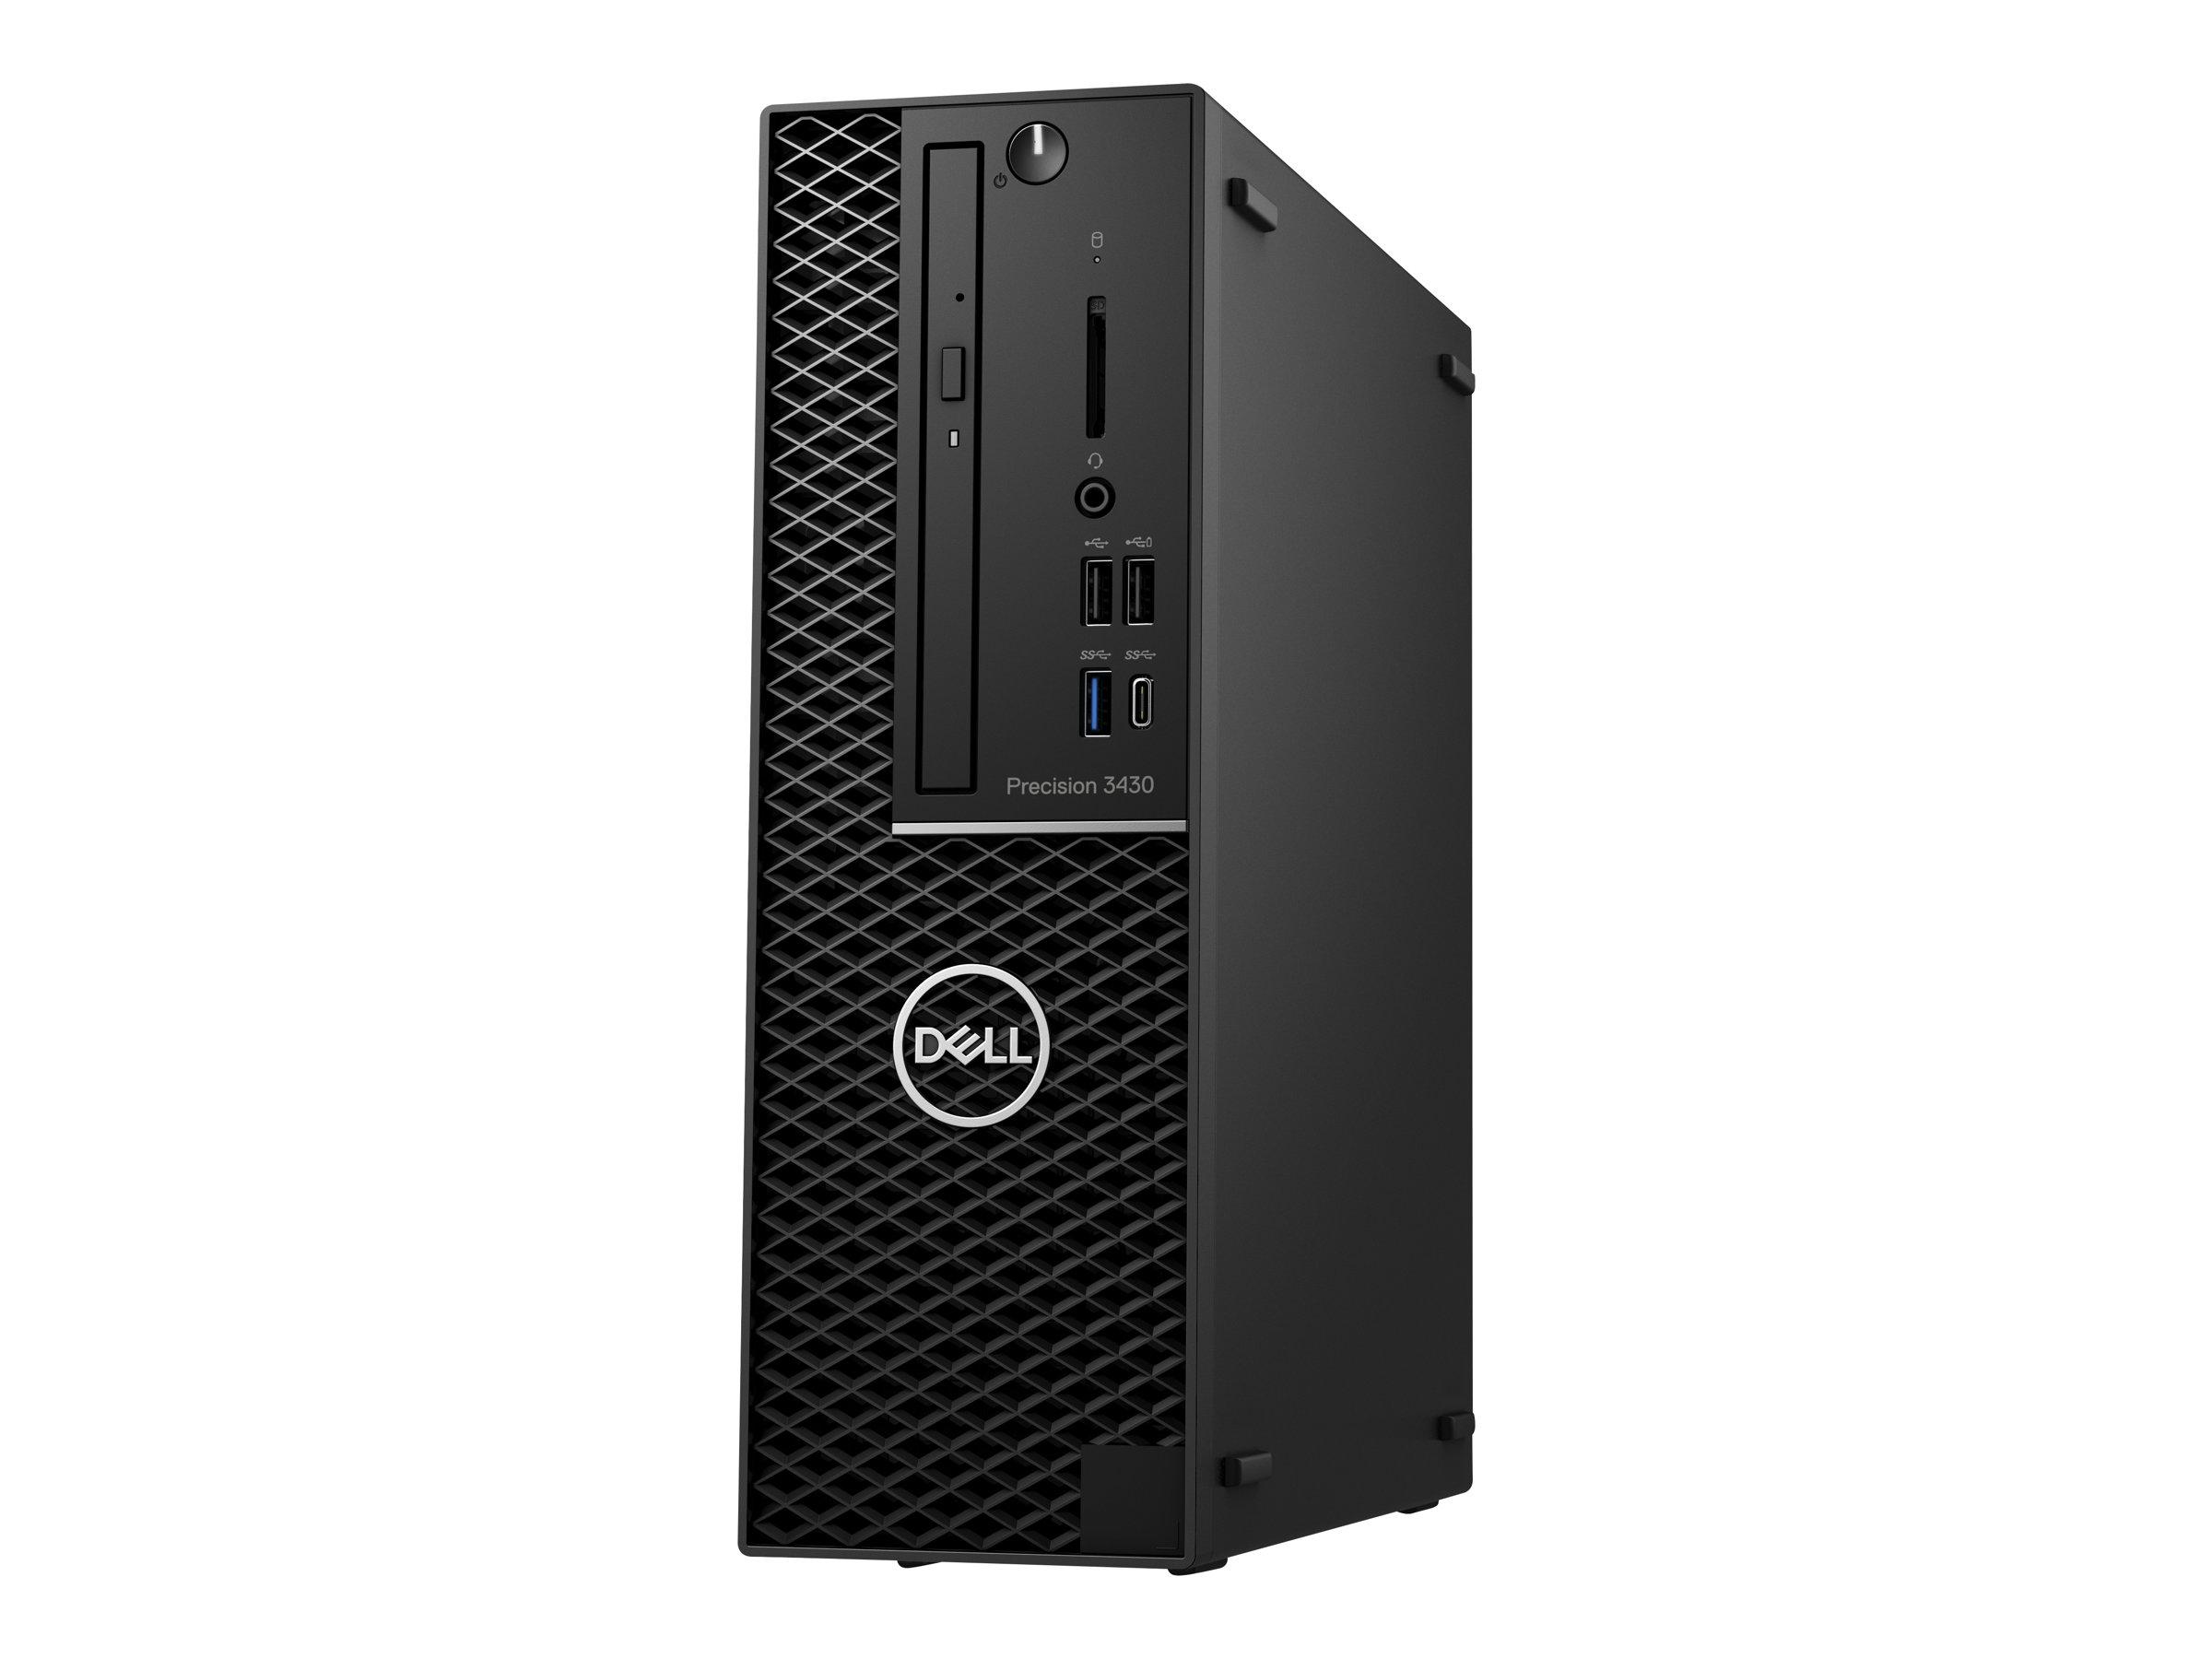 Dell Precision 3430 Small Form Factor - SFF - 1 x Core i7 8700 / 3.2 GHz - RAM 16 GB - SSD 256 GB - DVD-Writer